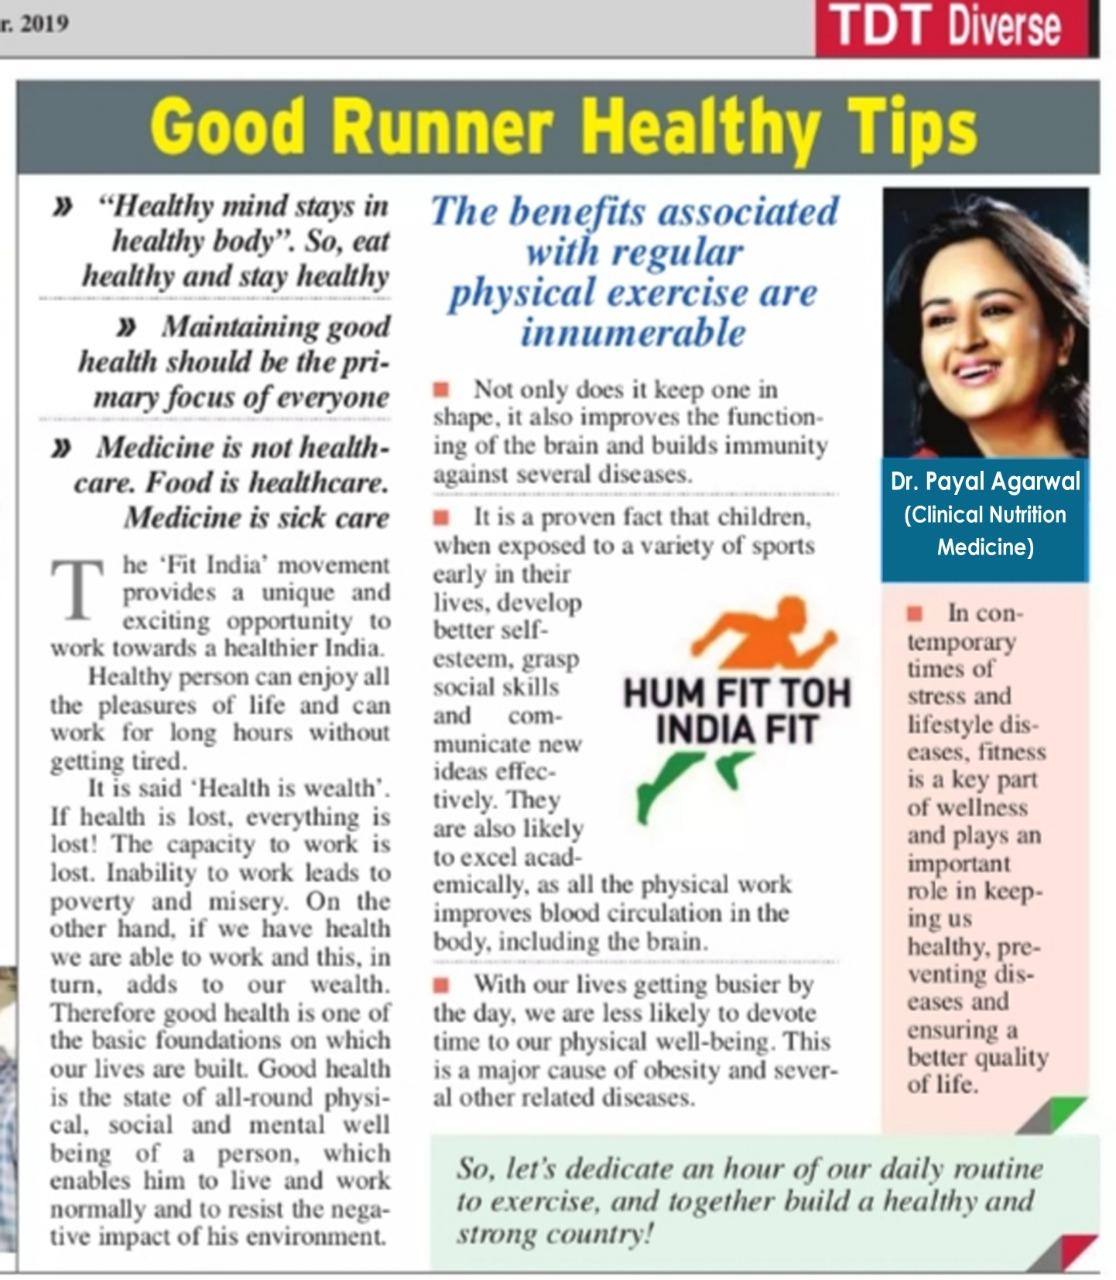 Good Runner Healthy Tips